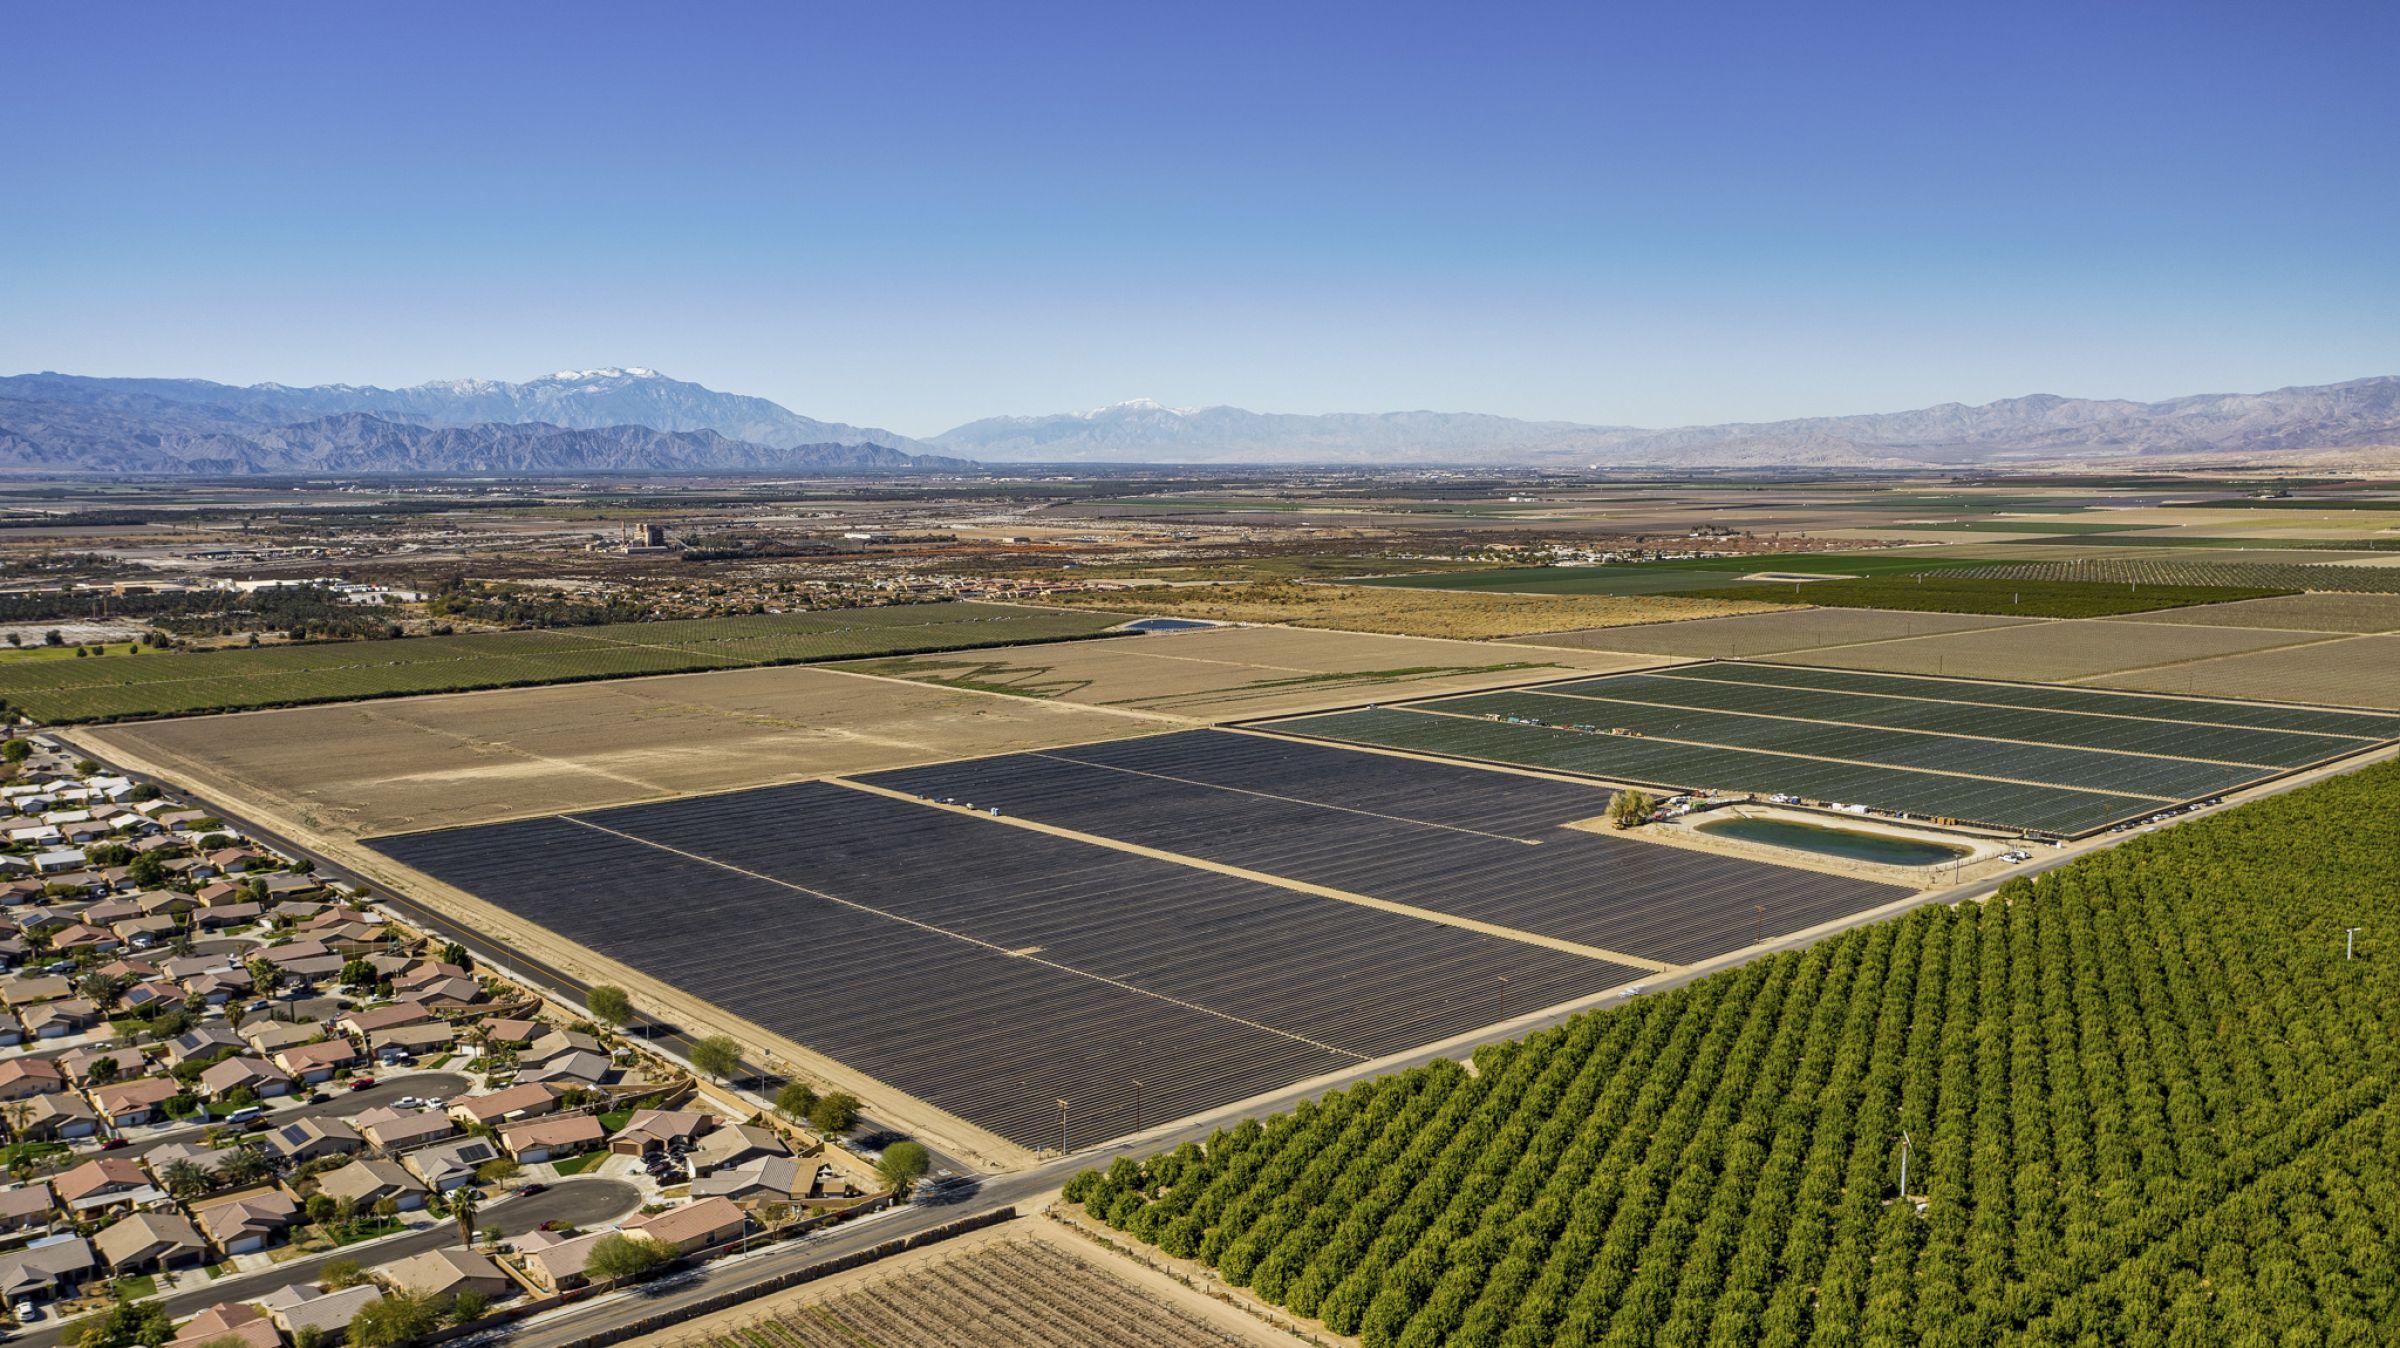 land-riverside-county-california-157-acres-listing-number-15582-0-2021-06-10-221309.jpg